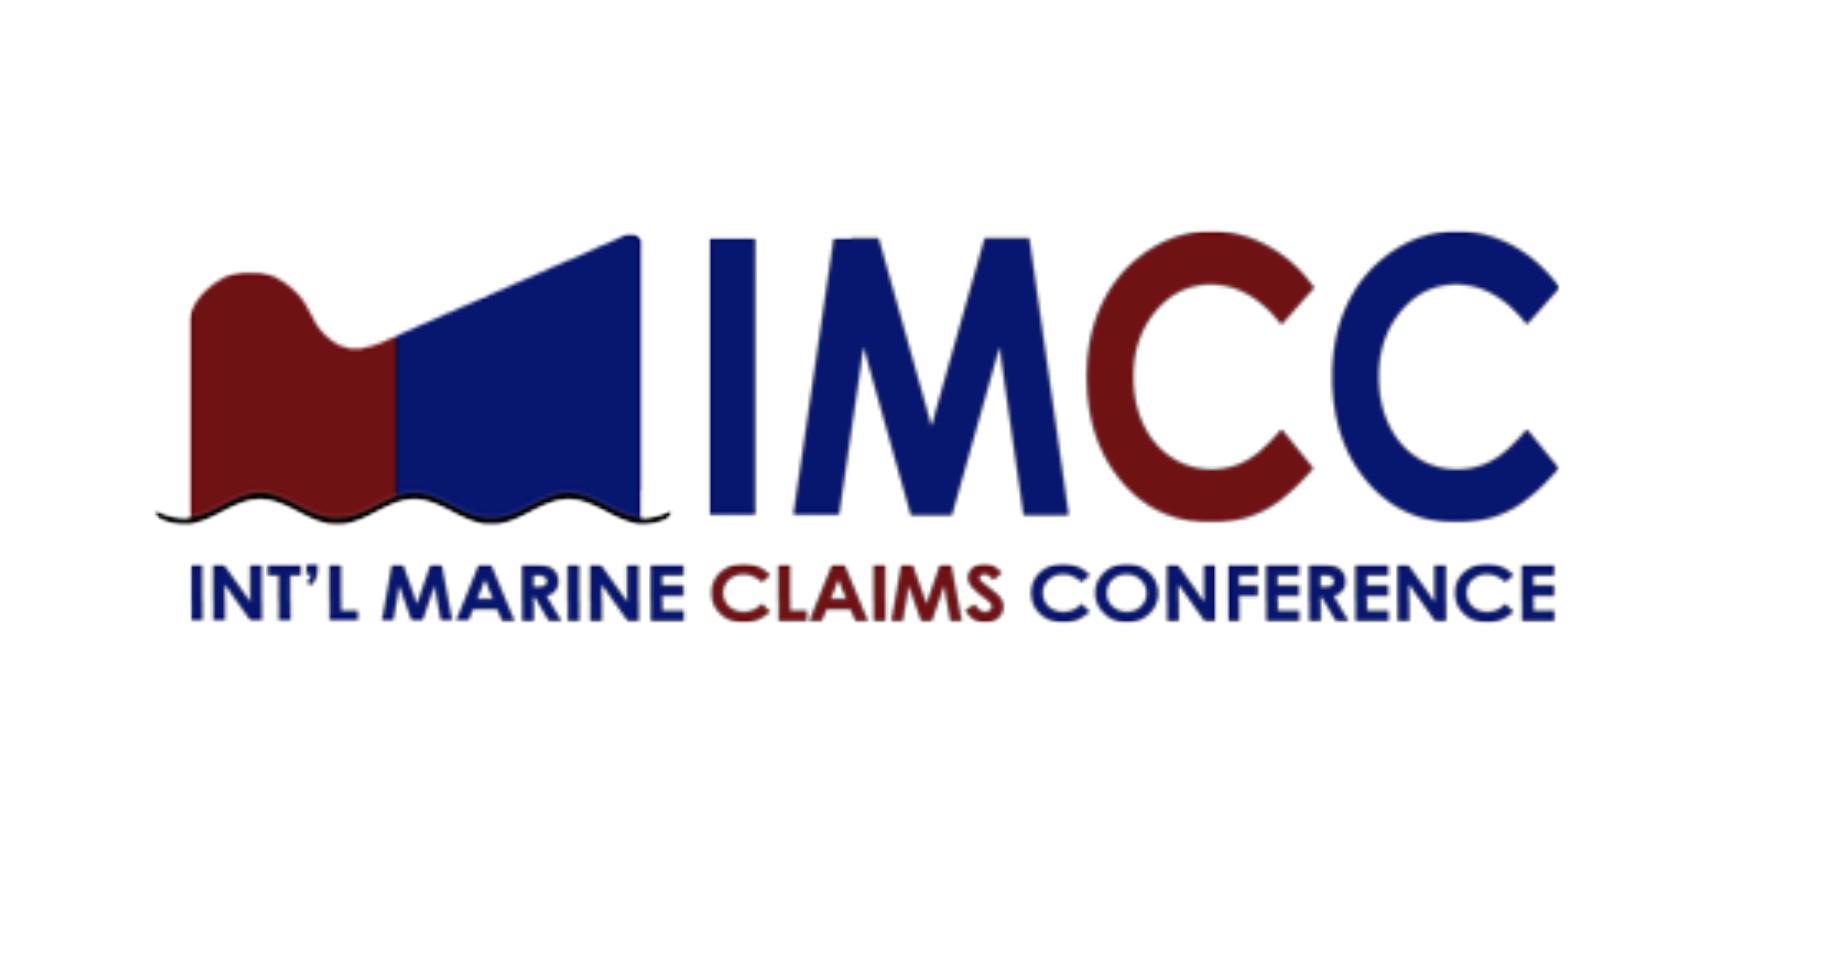 International Marine Claims Conference: Dublin